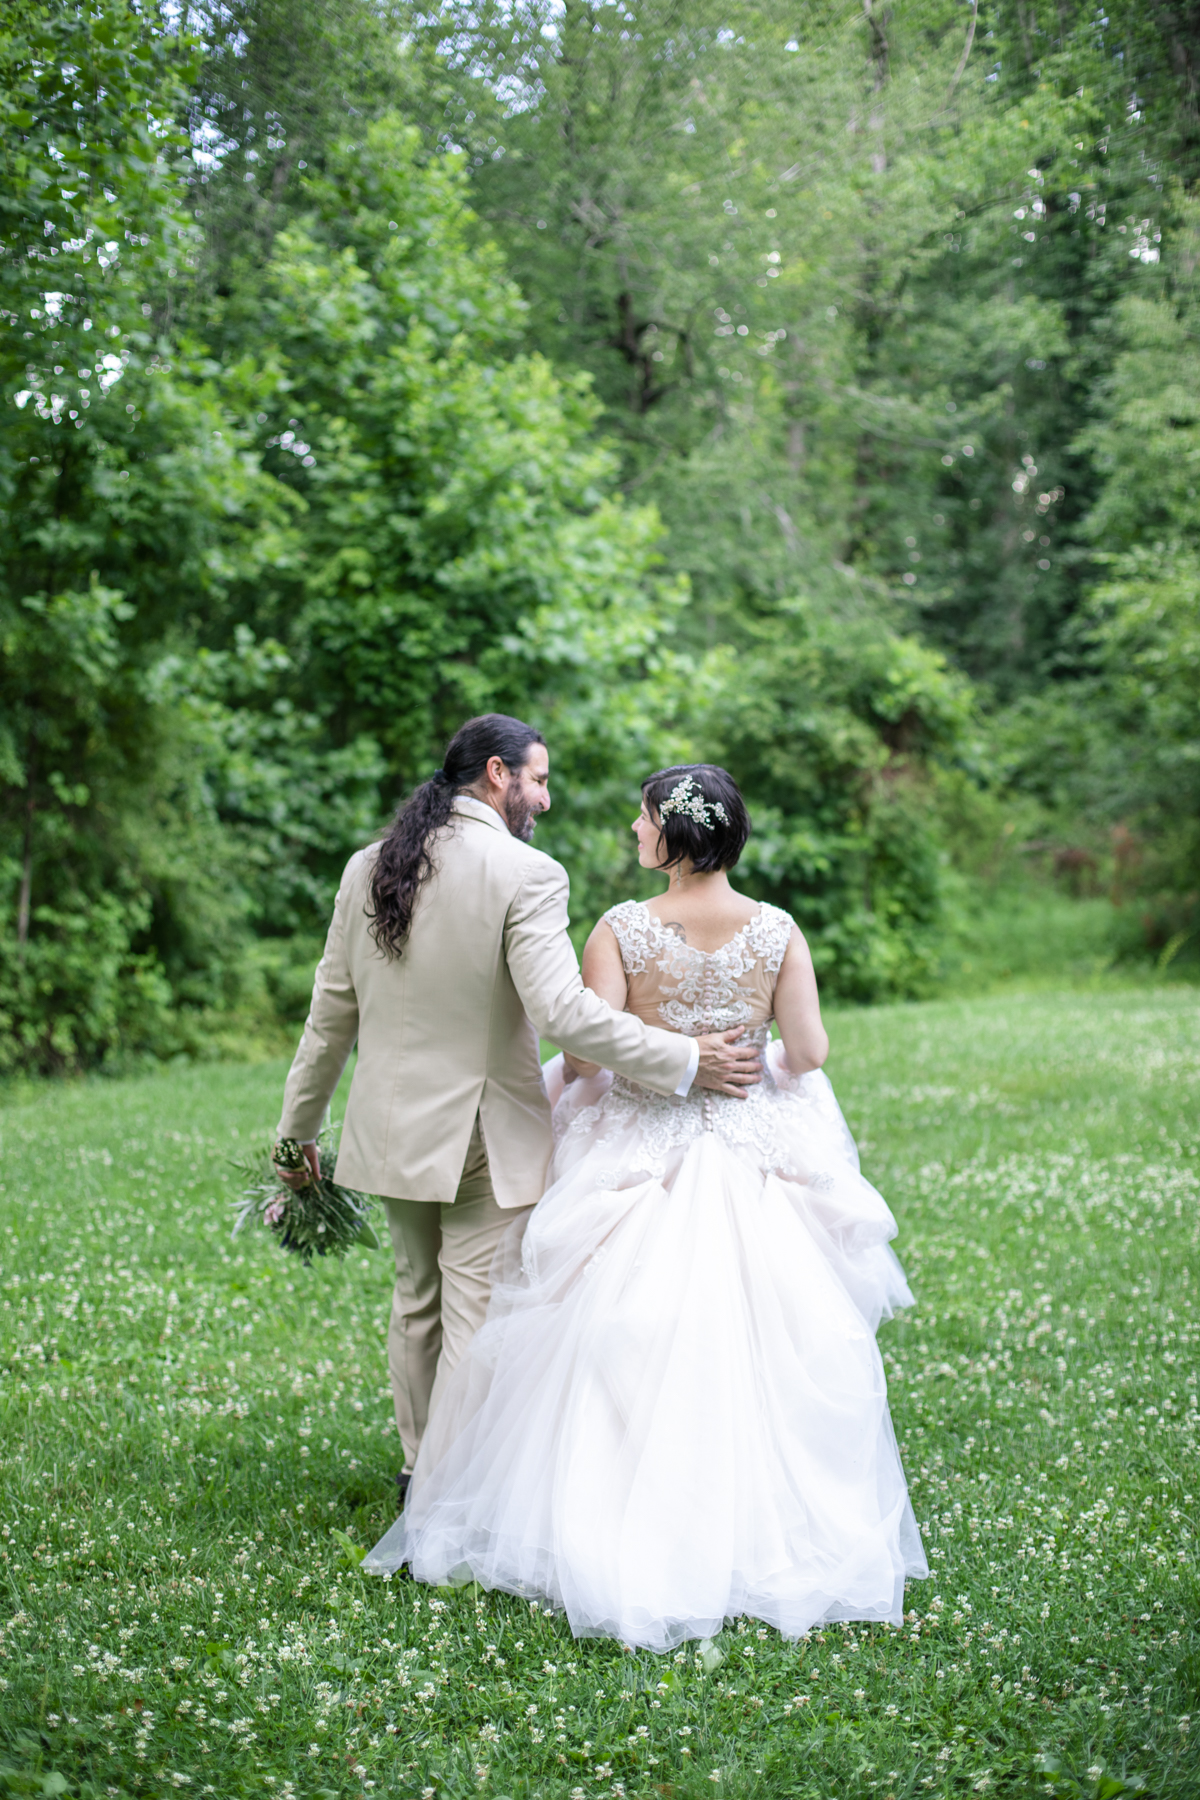 Avyanna and Phoenix Wedding 2019_photos by Studio Misha_BLOG-198.jpg